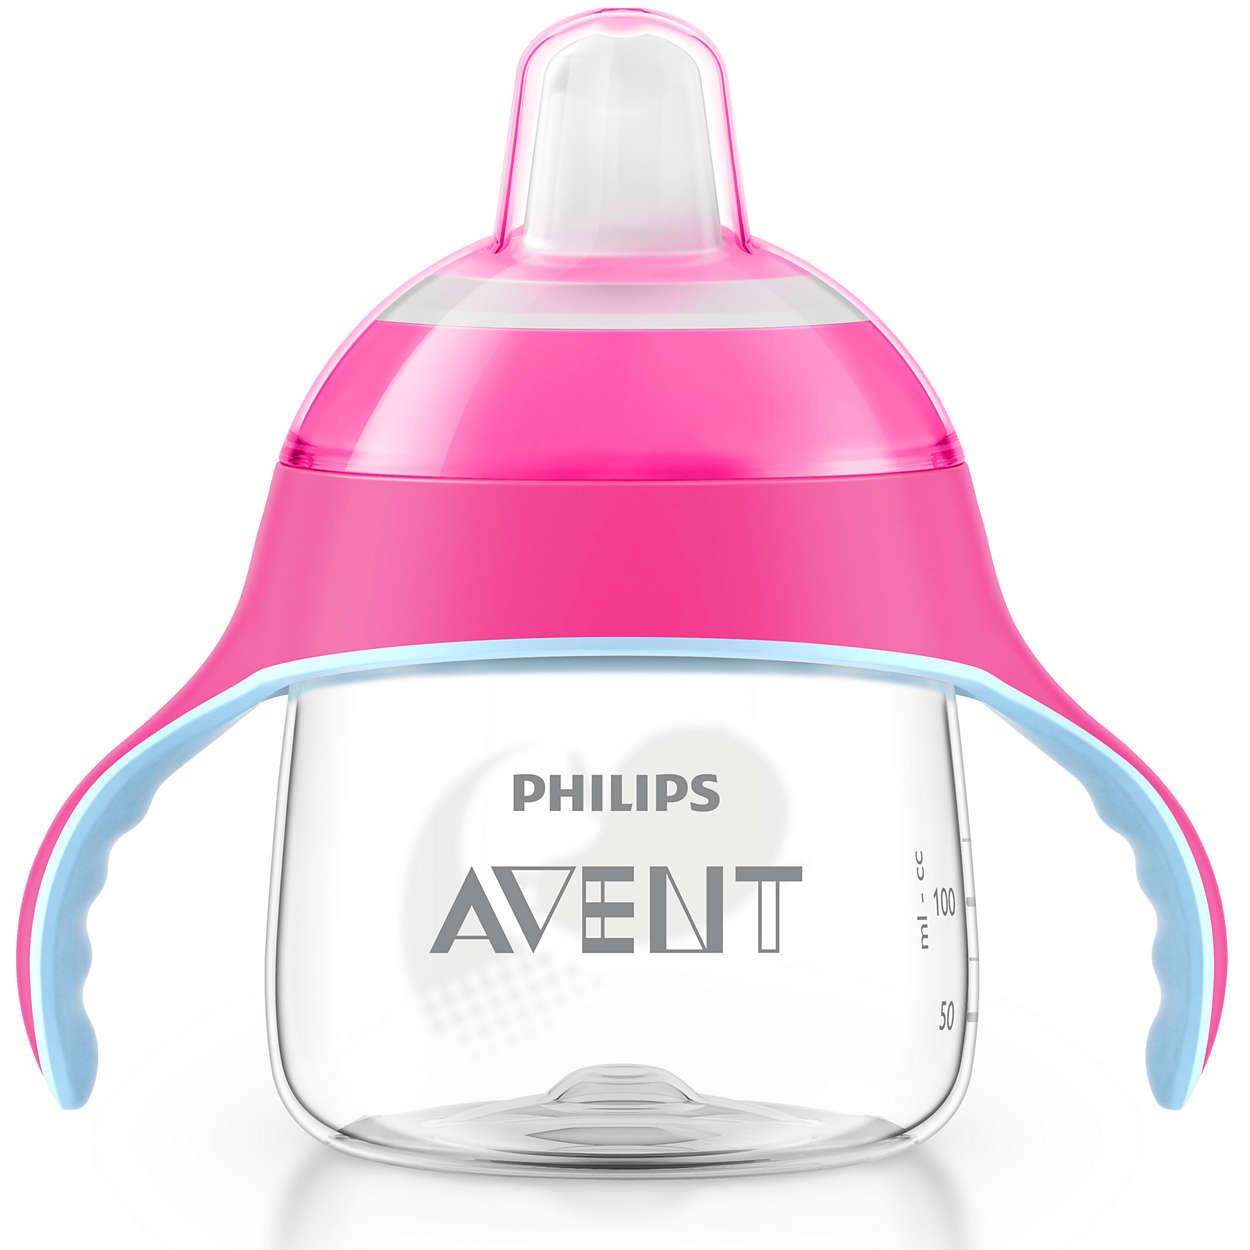 Avent Κύπελλο με Λαβές και Στόμιο Πλαστικό απο 6 Μηνών+ 200ml 1τεμάχιο – ροζ